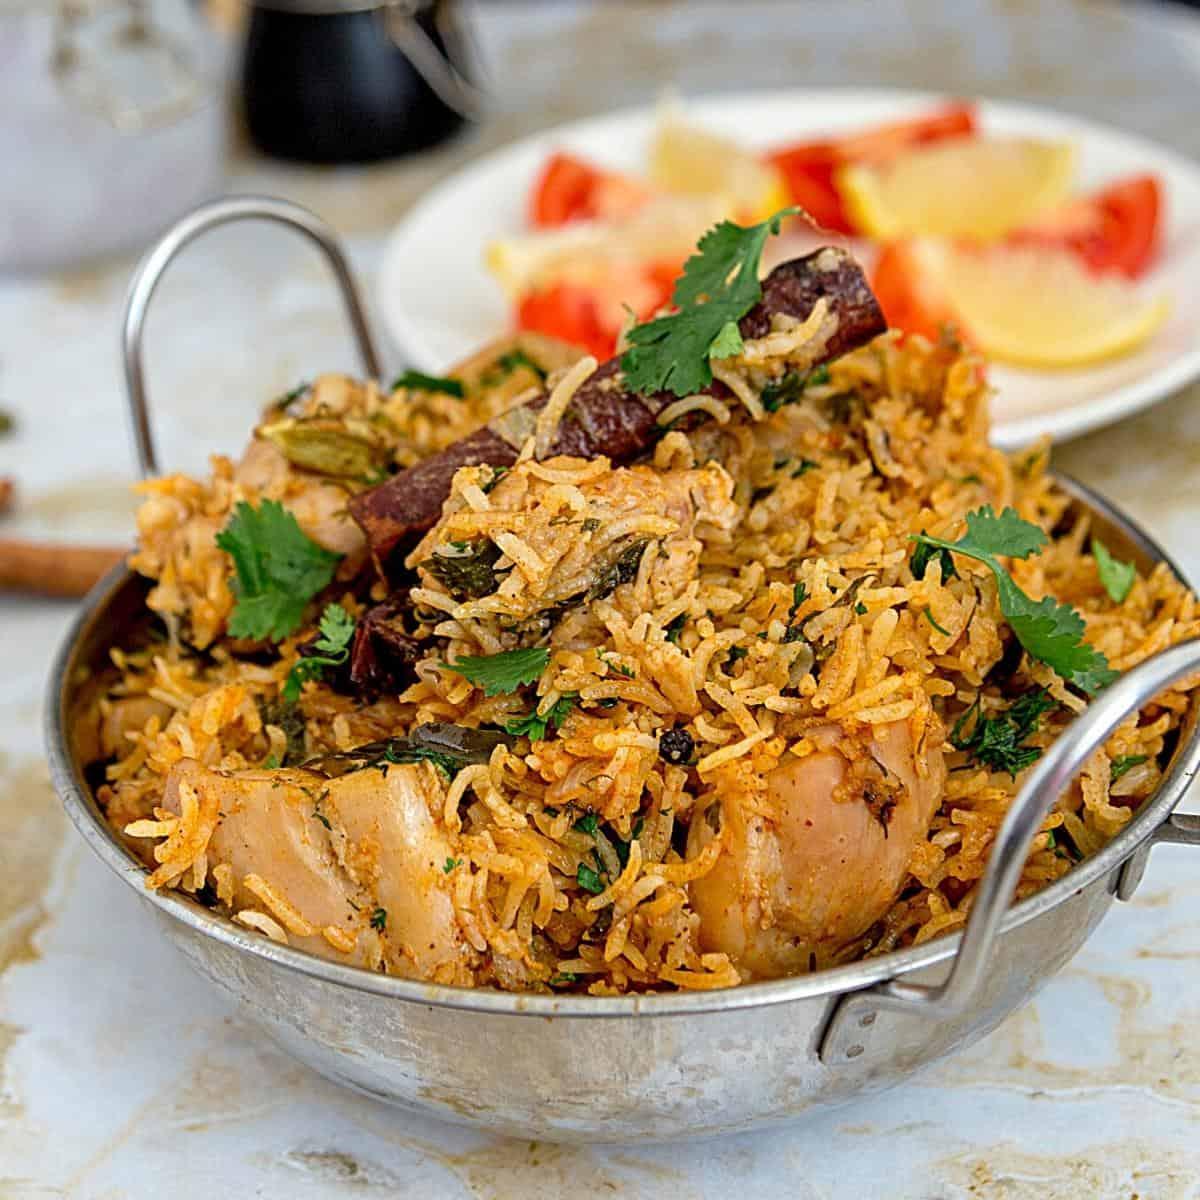 An Indian pot with chicken biryani.